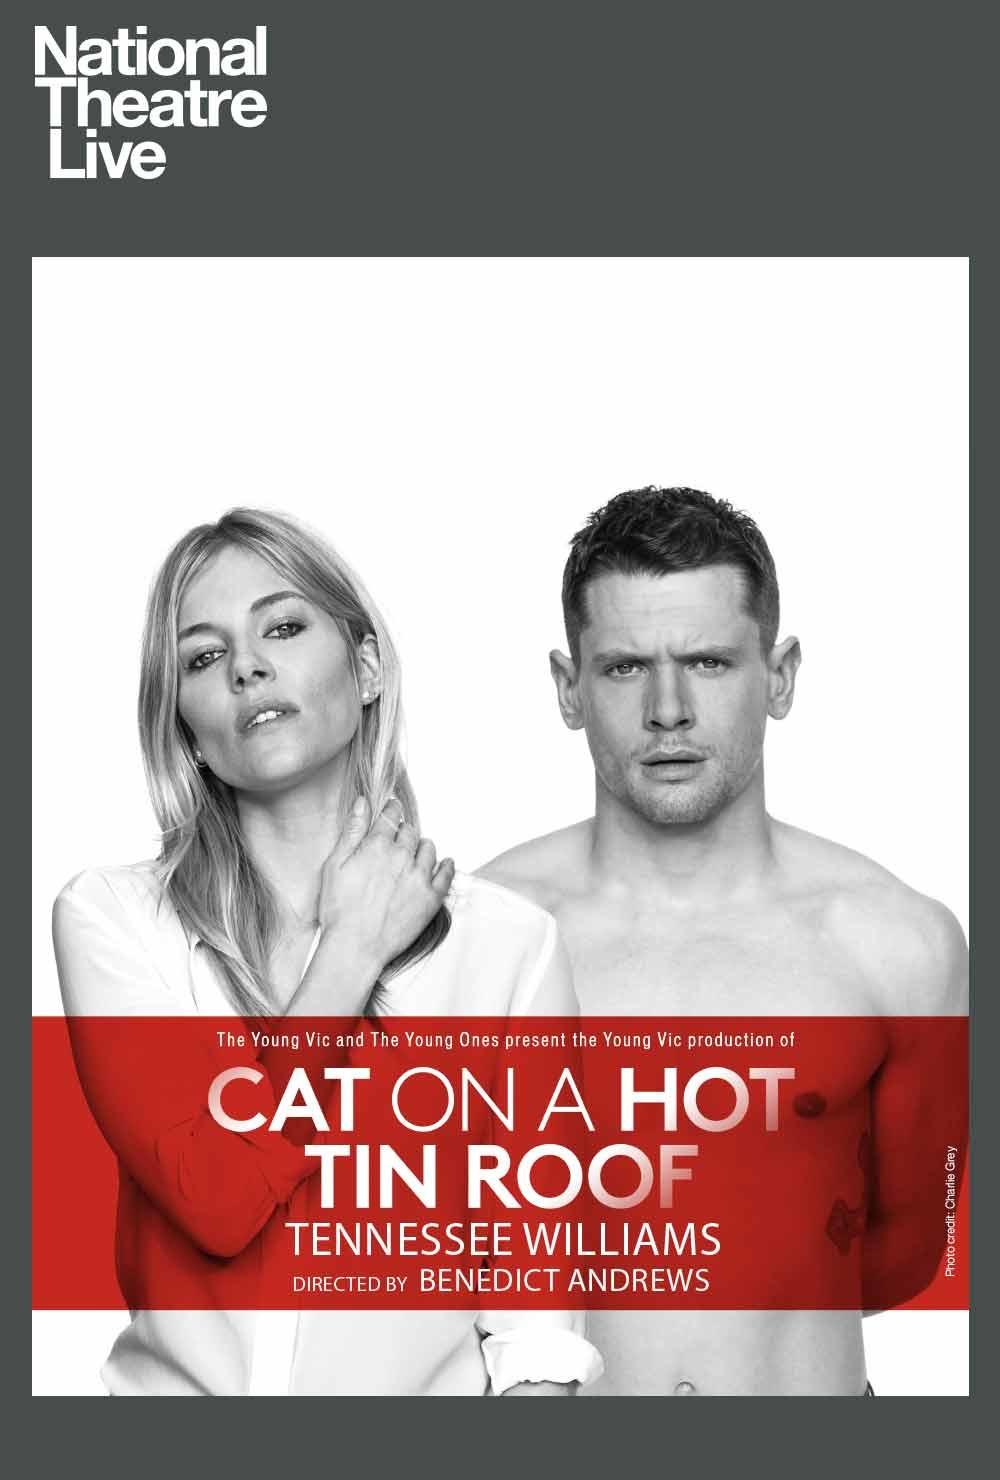 Panny [NT Live] 英國國家劇院現場:朱門巧婦(Cat on a Hot Tin Roof) #席安娜米勒 #傑克歐康納 - #n0g0n0 - Plurk